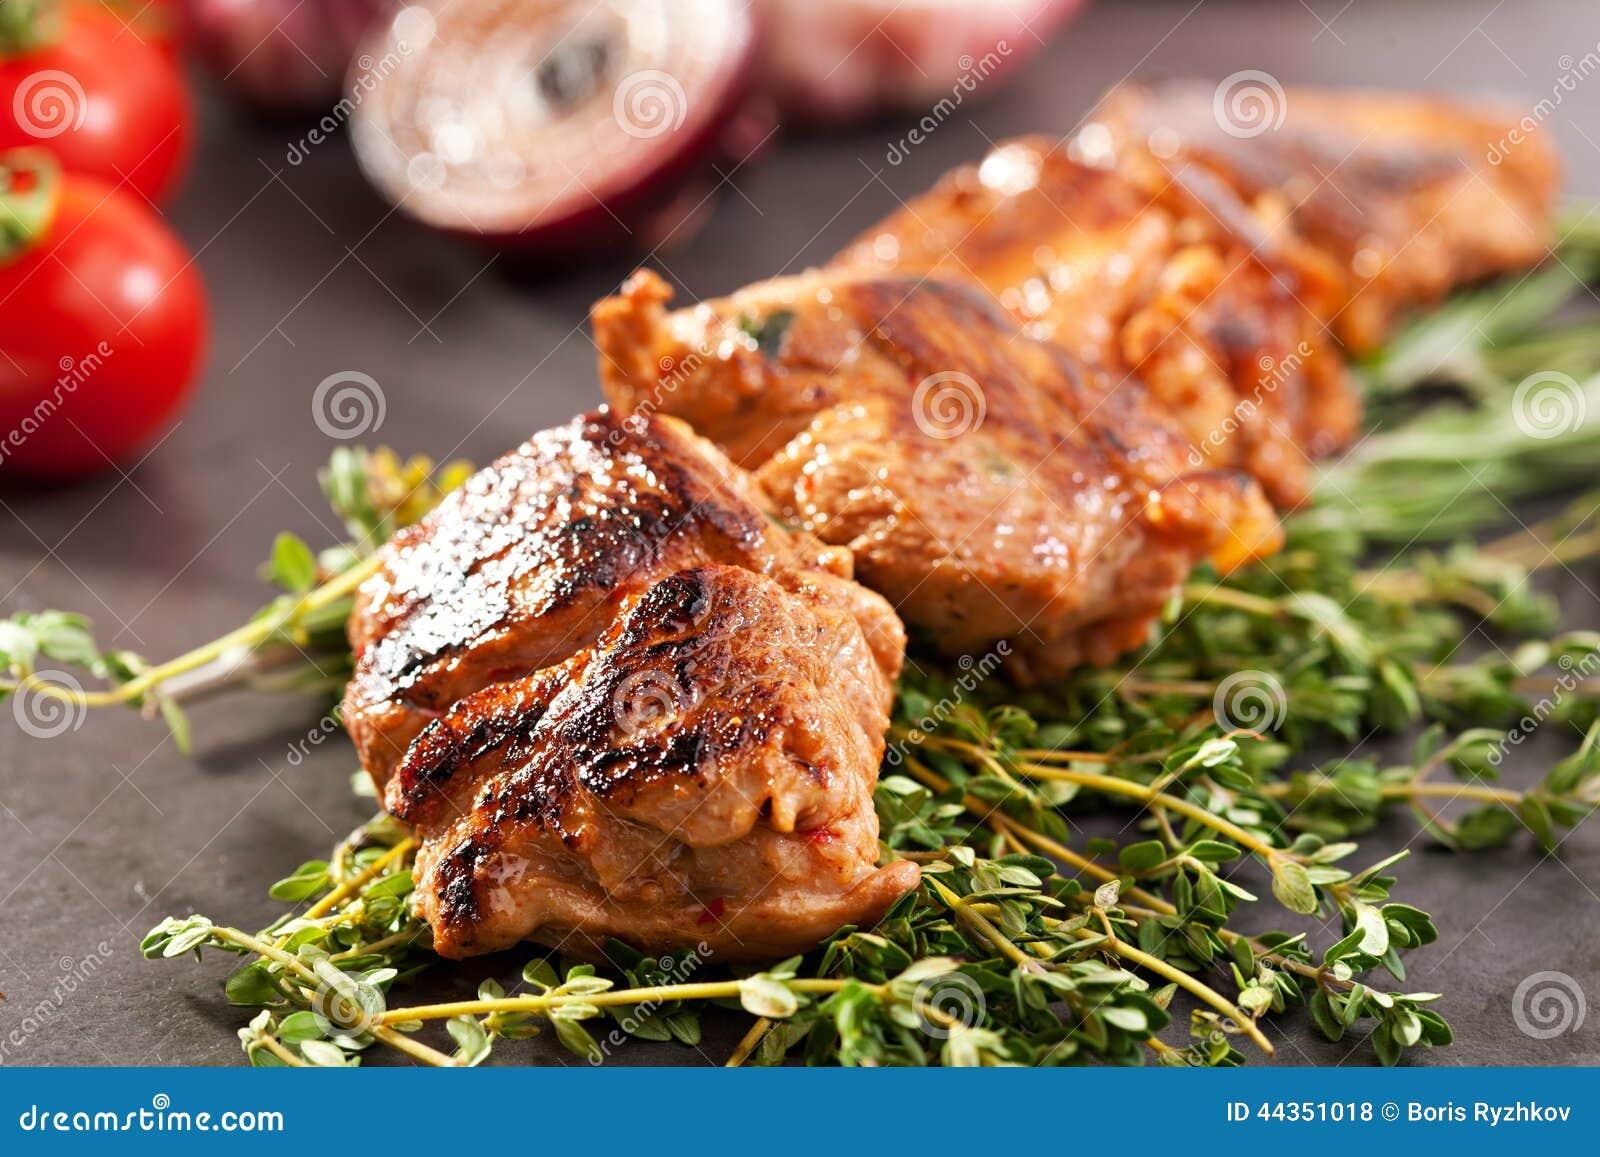 Skewered griskött